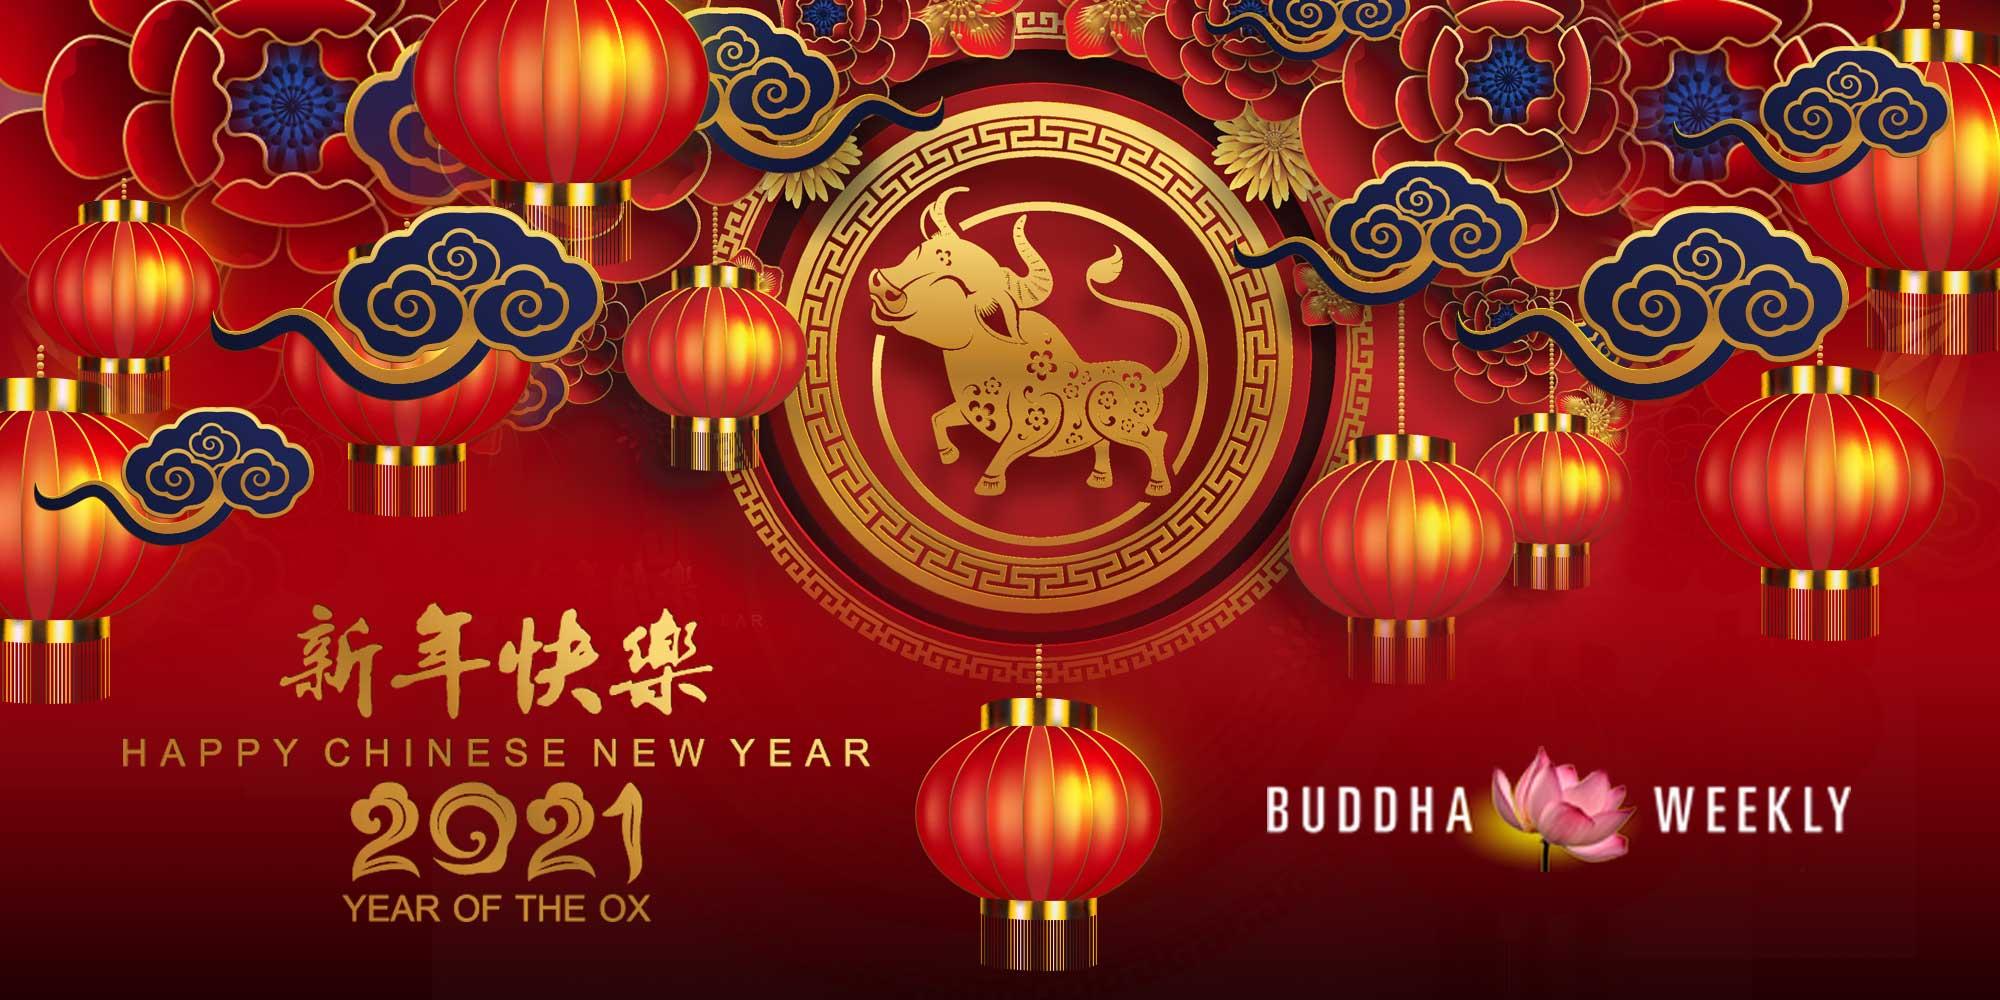 Buddha weekly year of